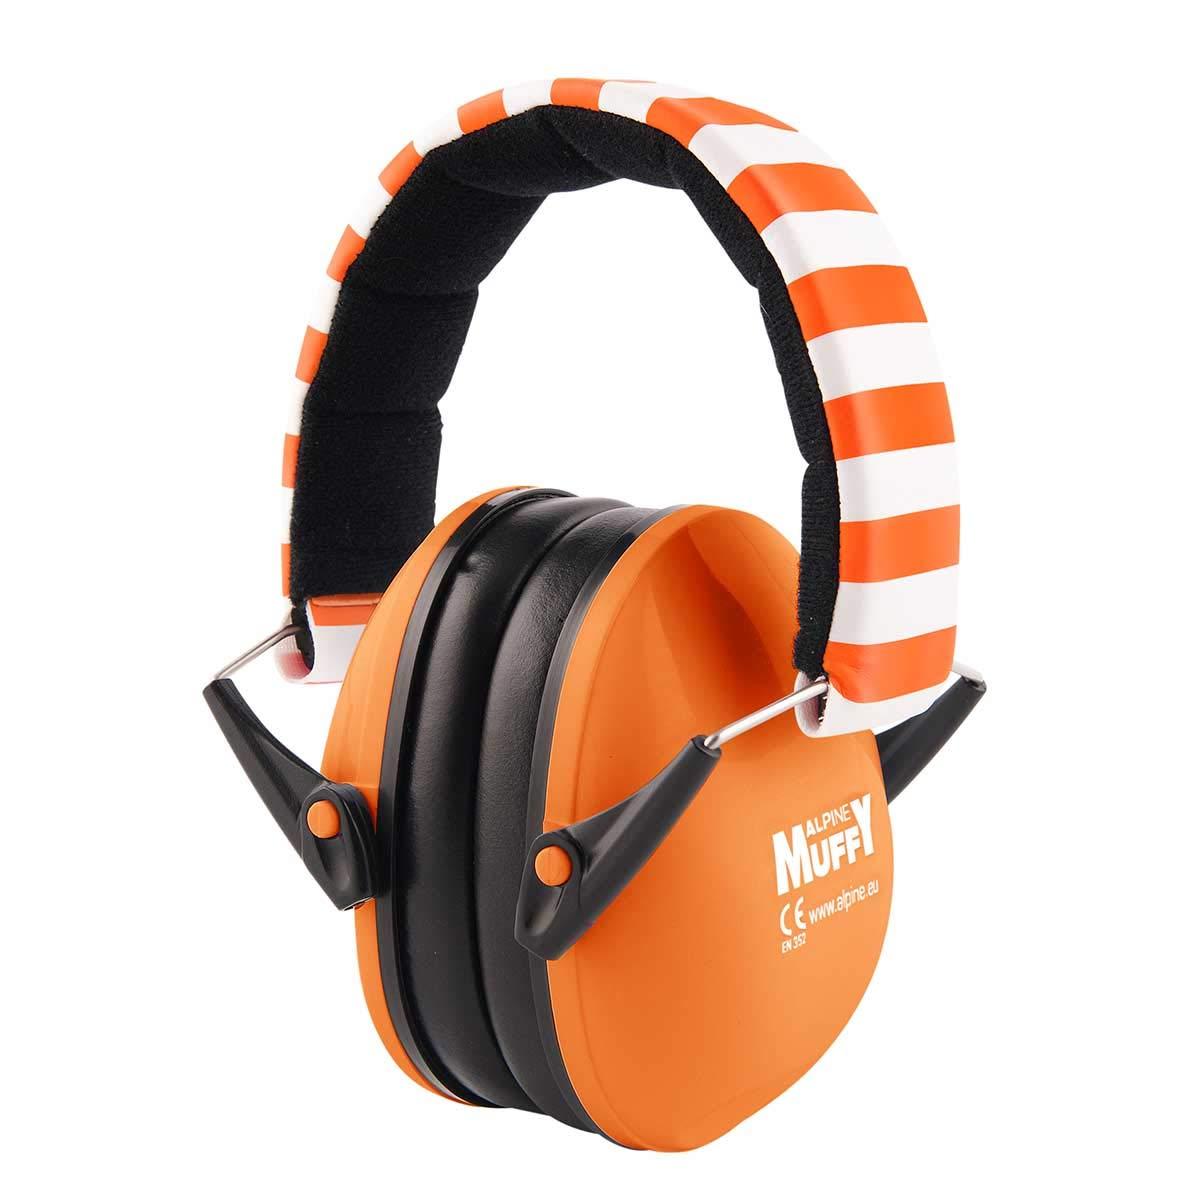 Adjustable Ear Protectors for Kids Black Ear Muffs Alpine Muffy